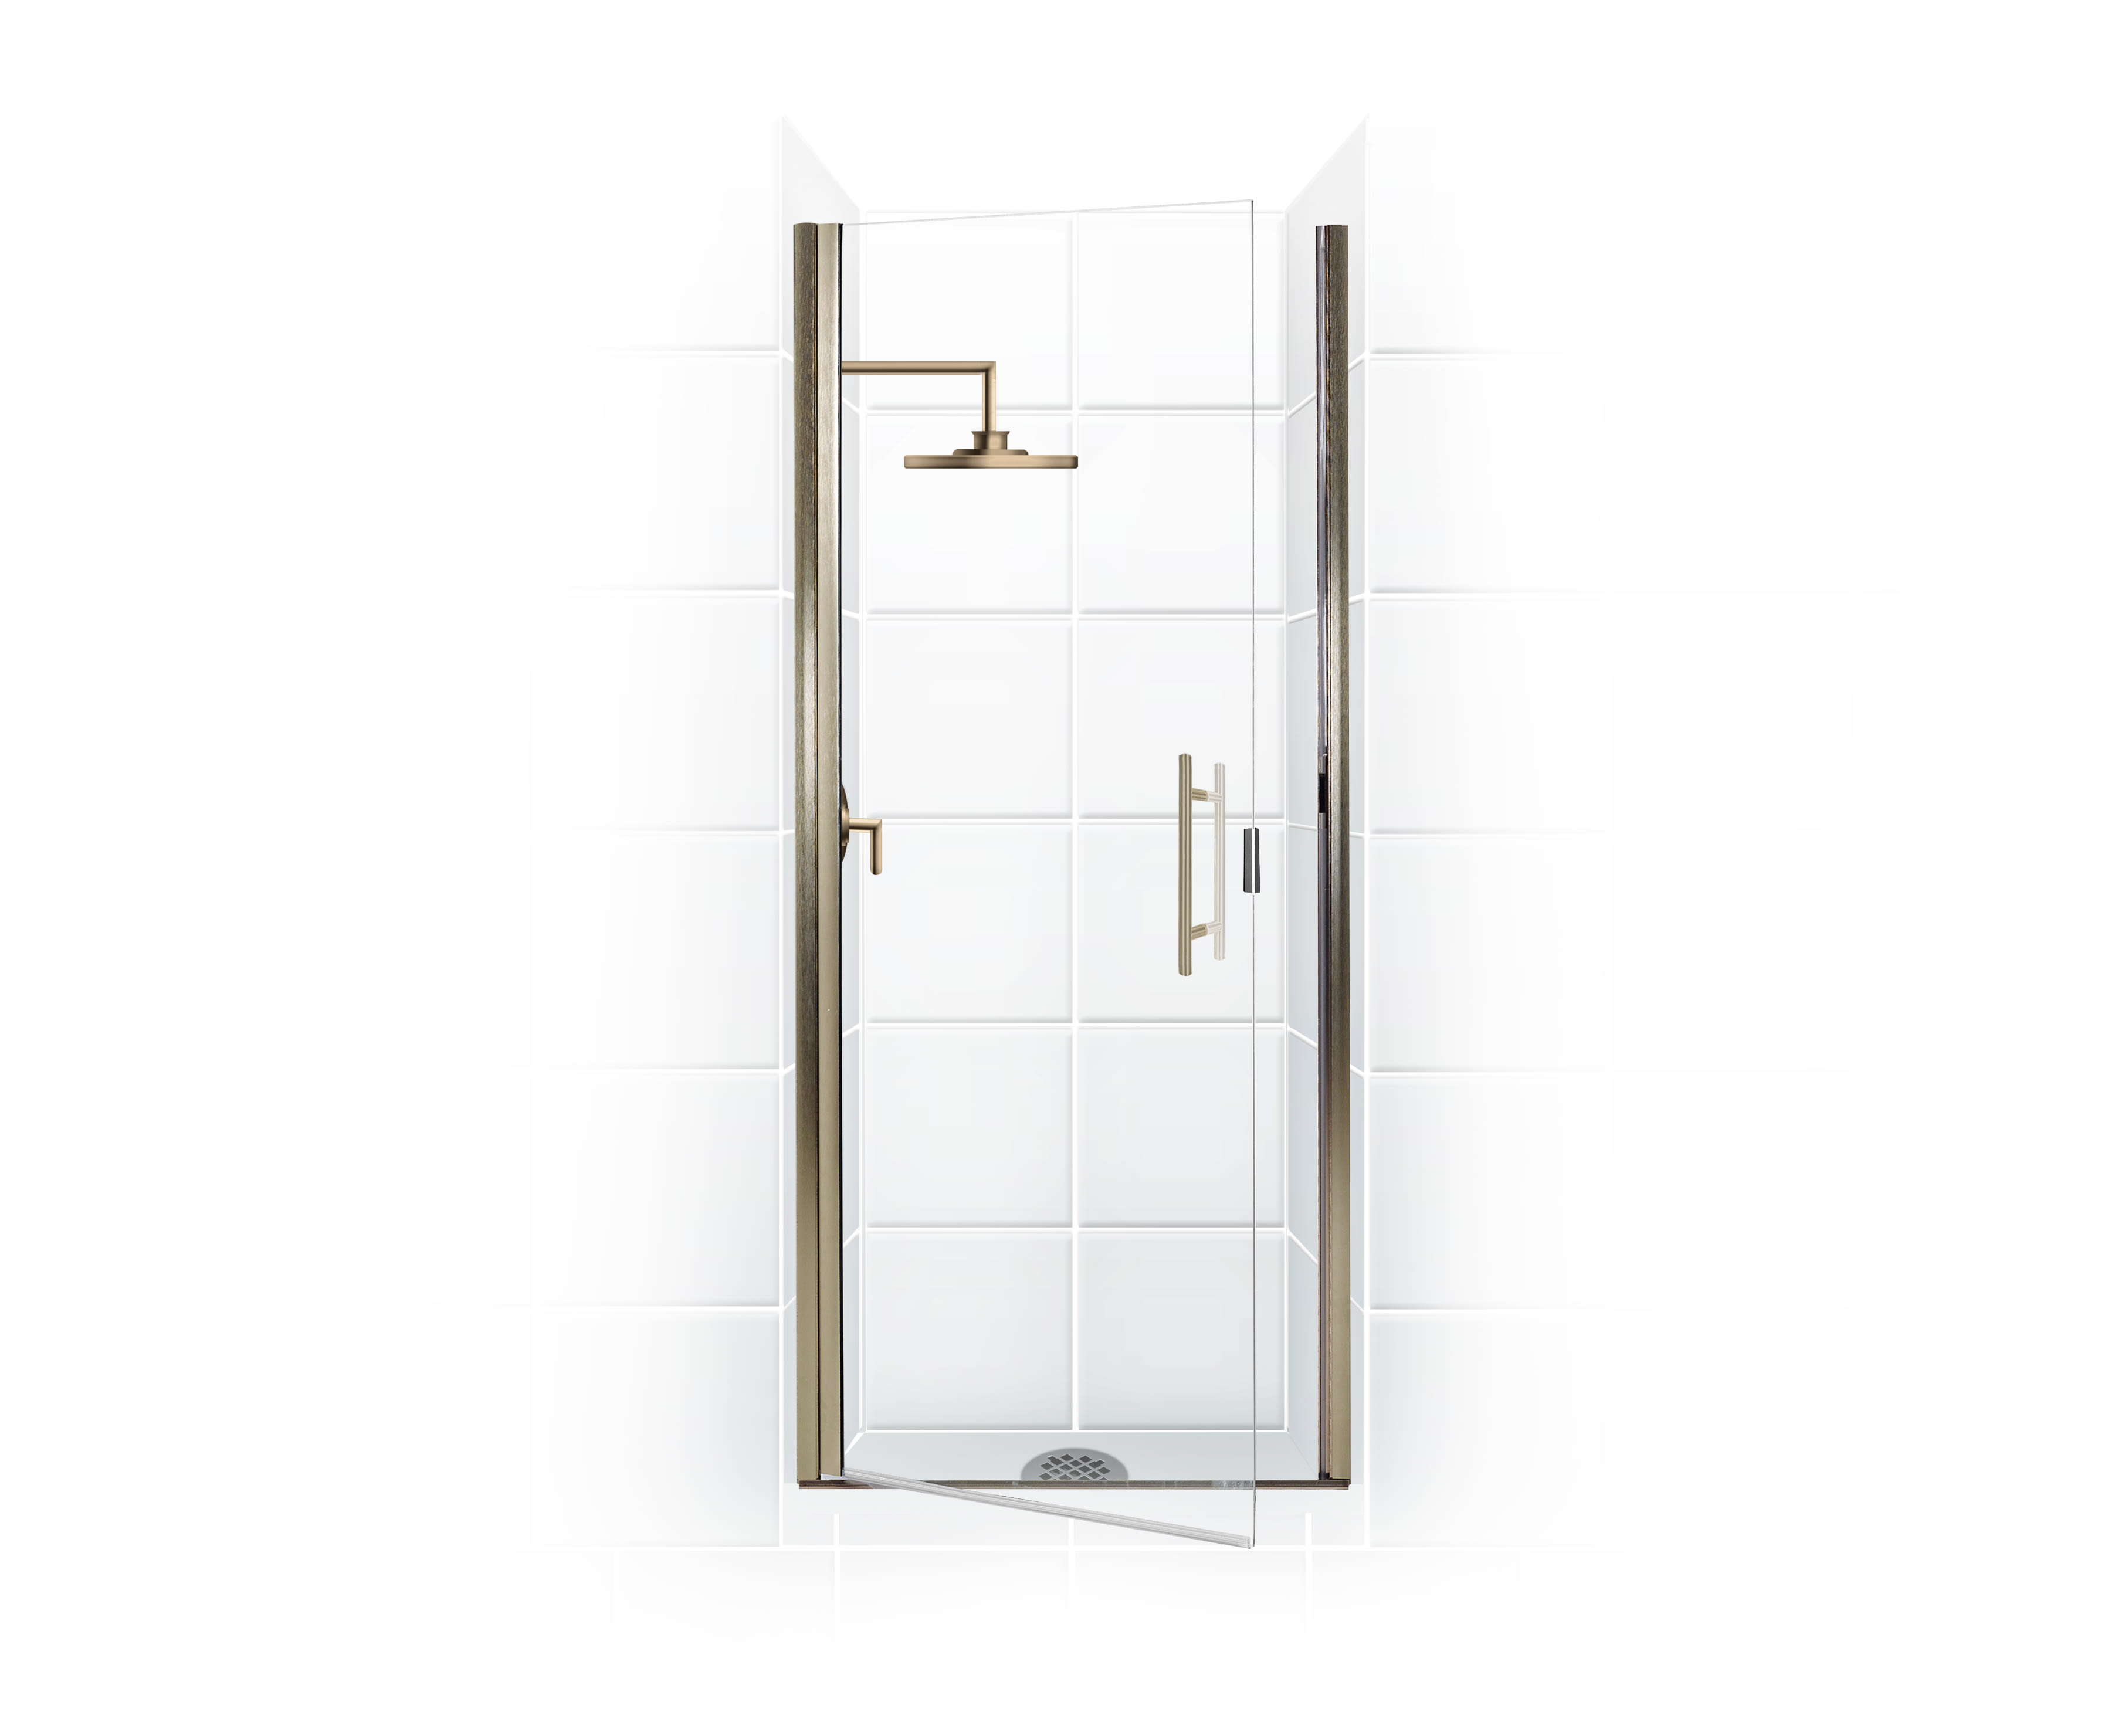 Coastal Shower Doors Plqfr33 70 C